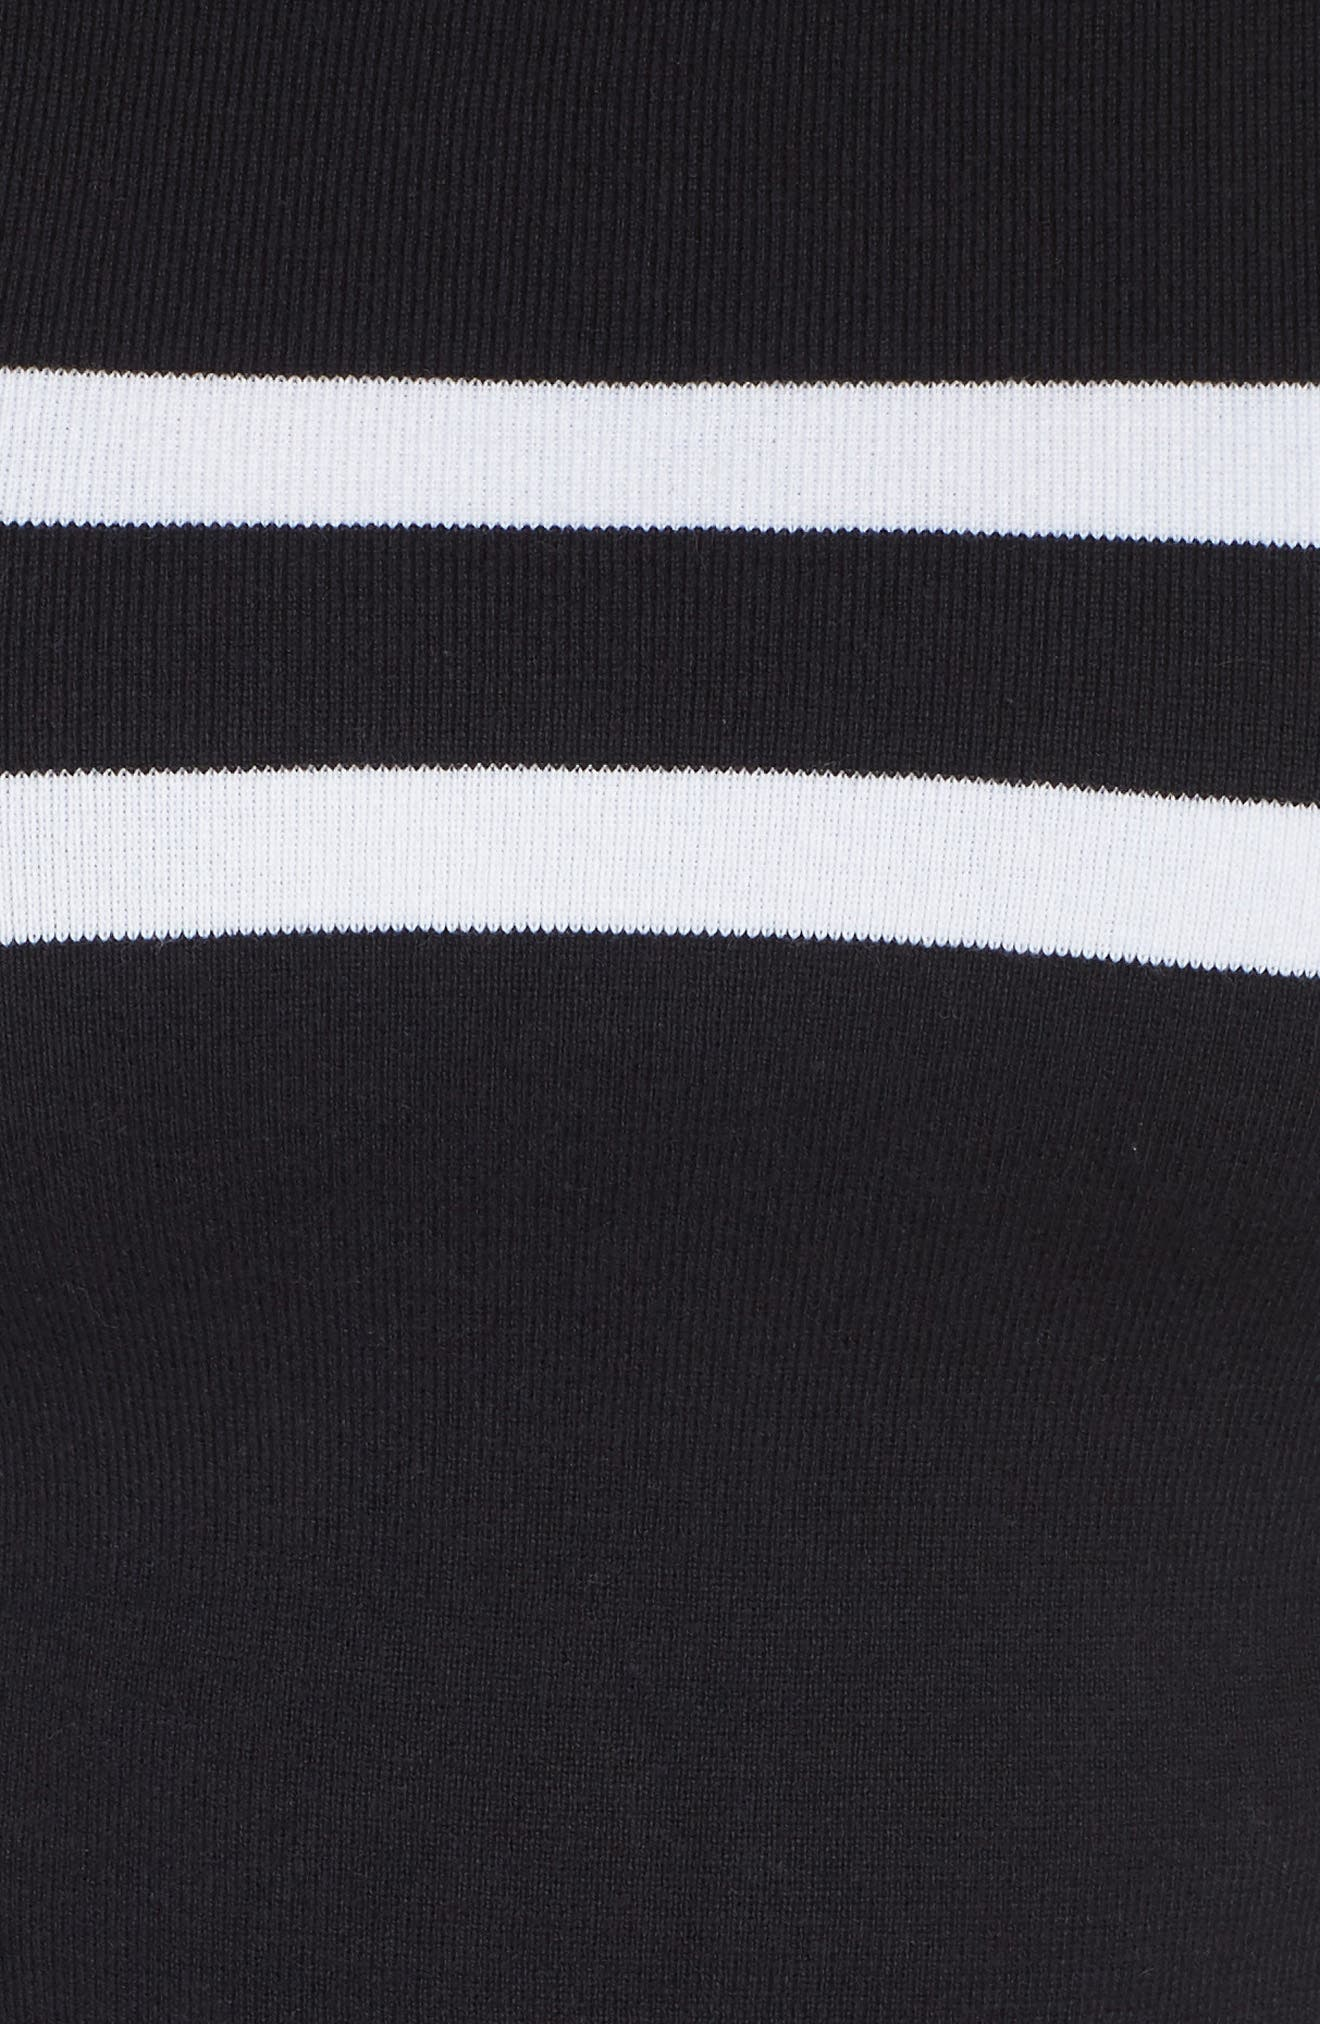 Nala Crop Sweater,                             Alternate thumbnail 6, color,                             INDIGO